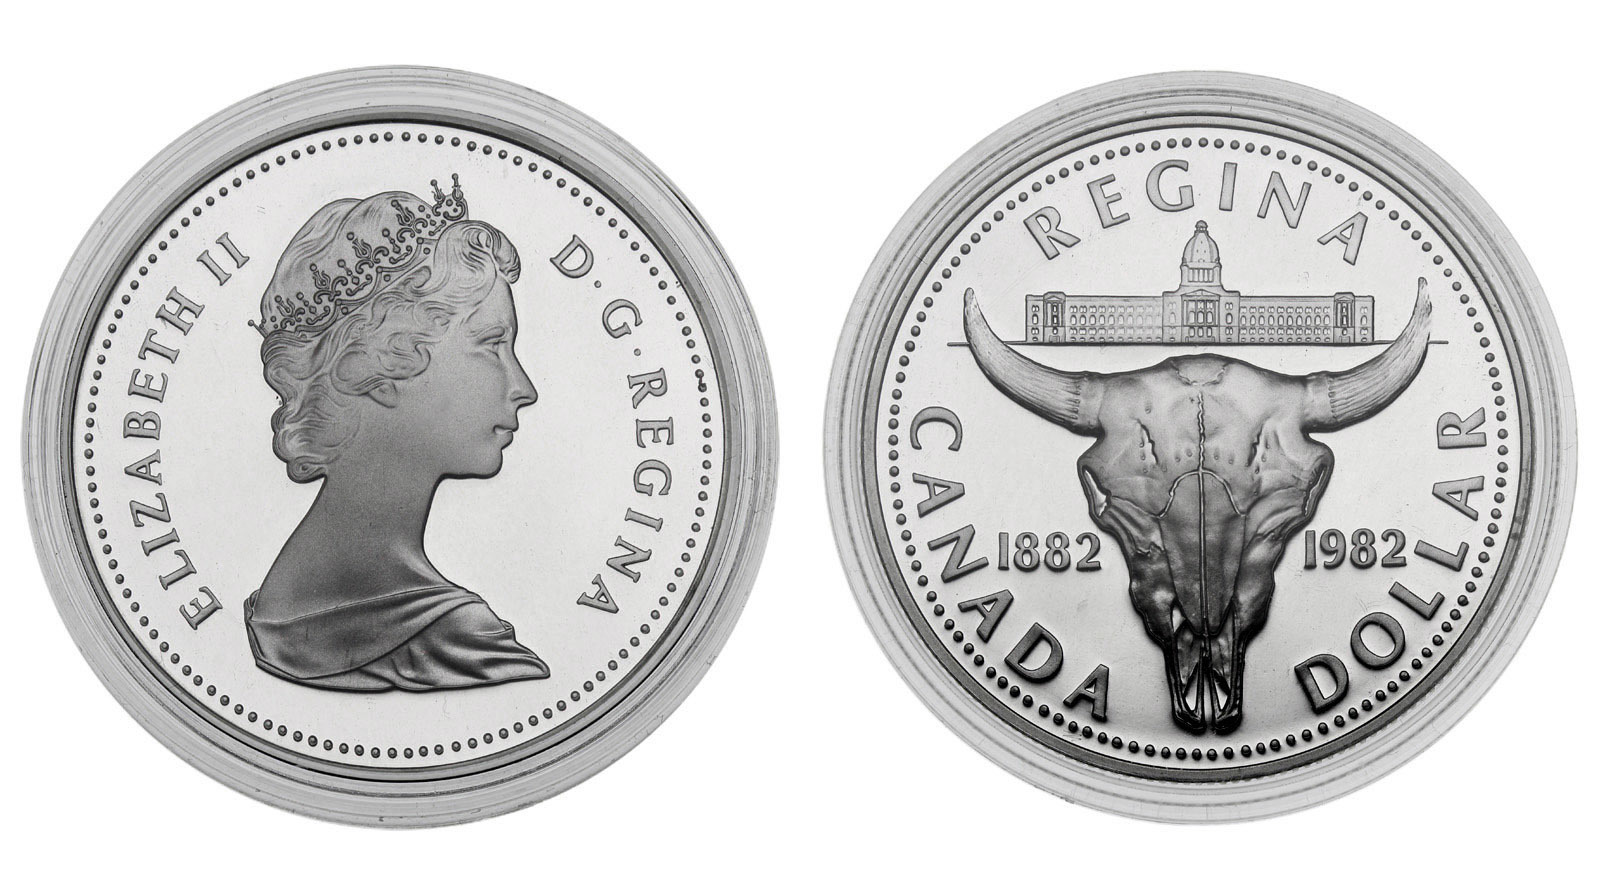 1 доллар. 100 лет городу Реджайна. Канада. Серебро. 1982 год. Proof